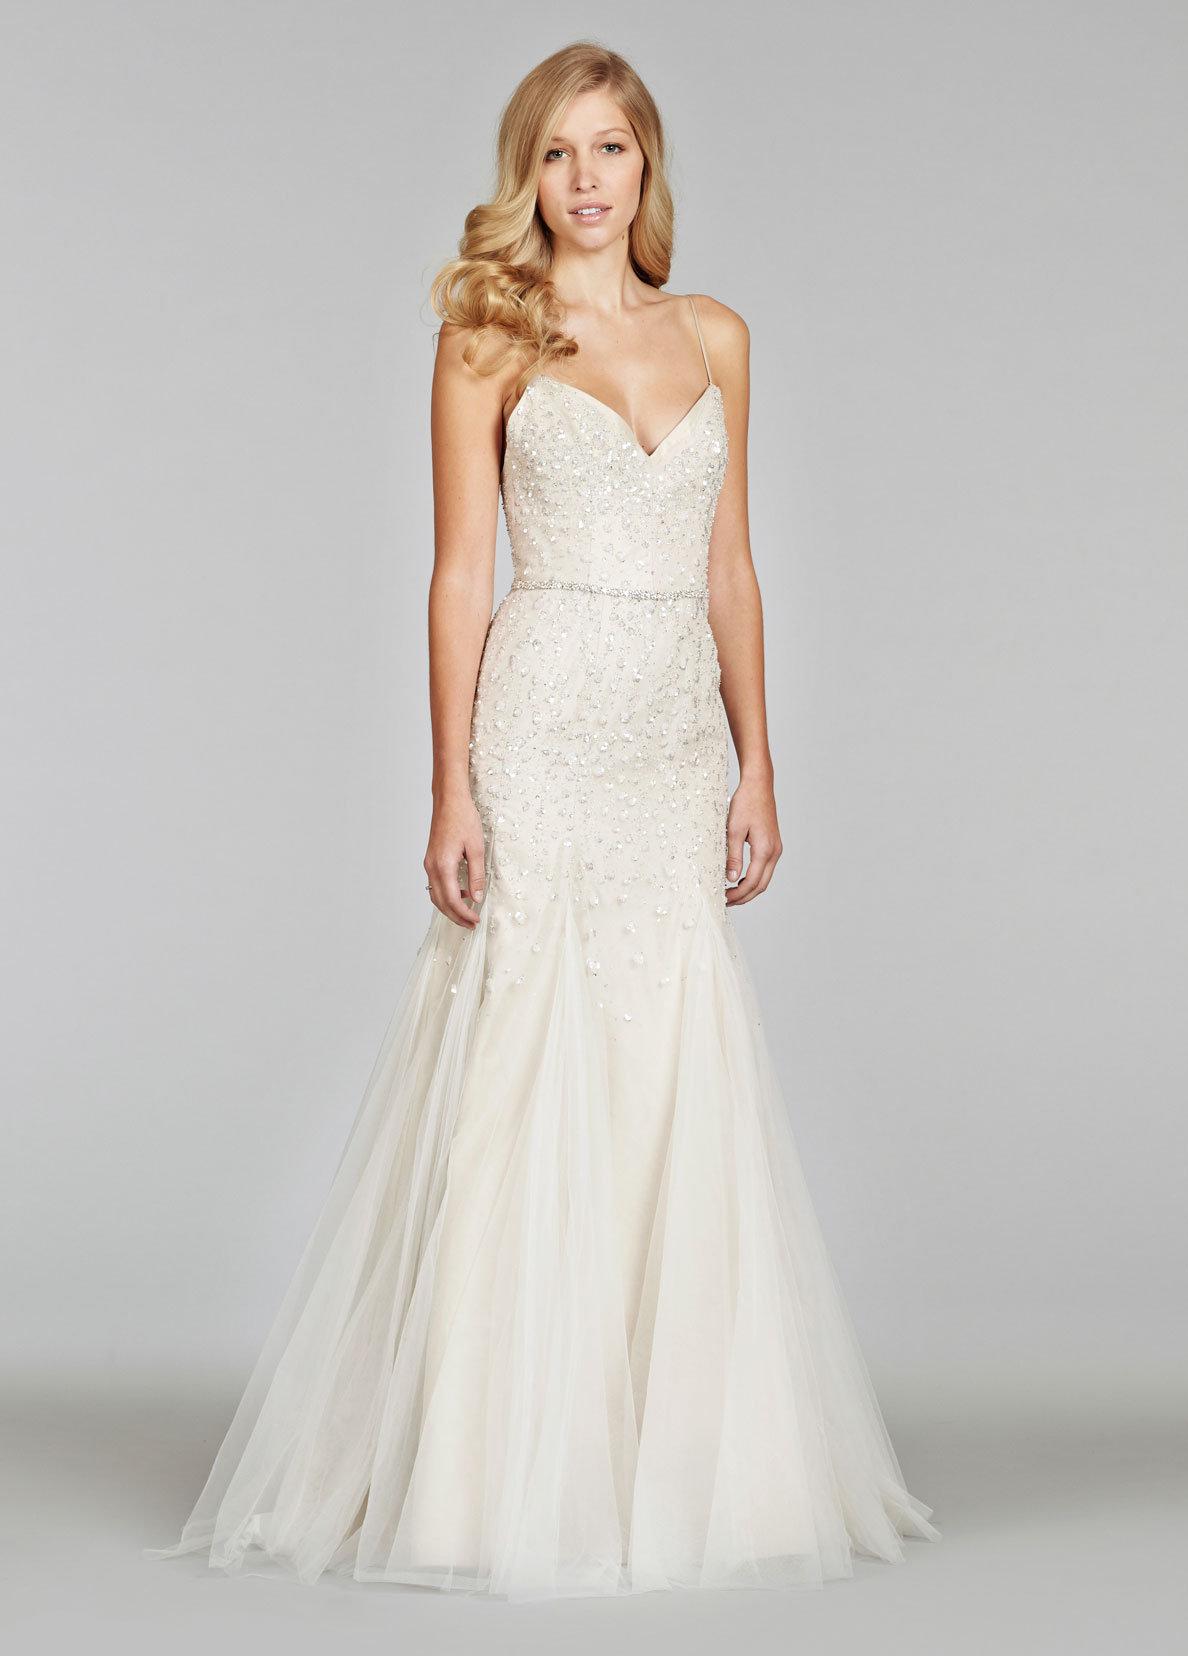 Sequin Wedding Dress Ivory | Wedding